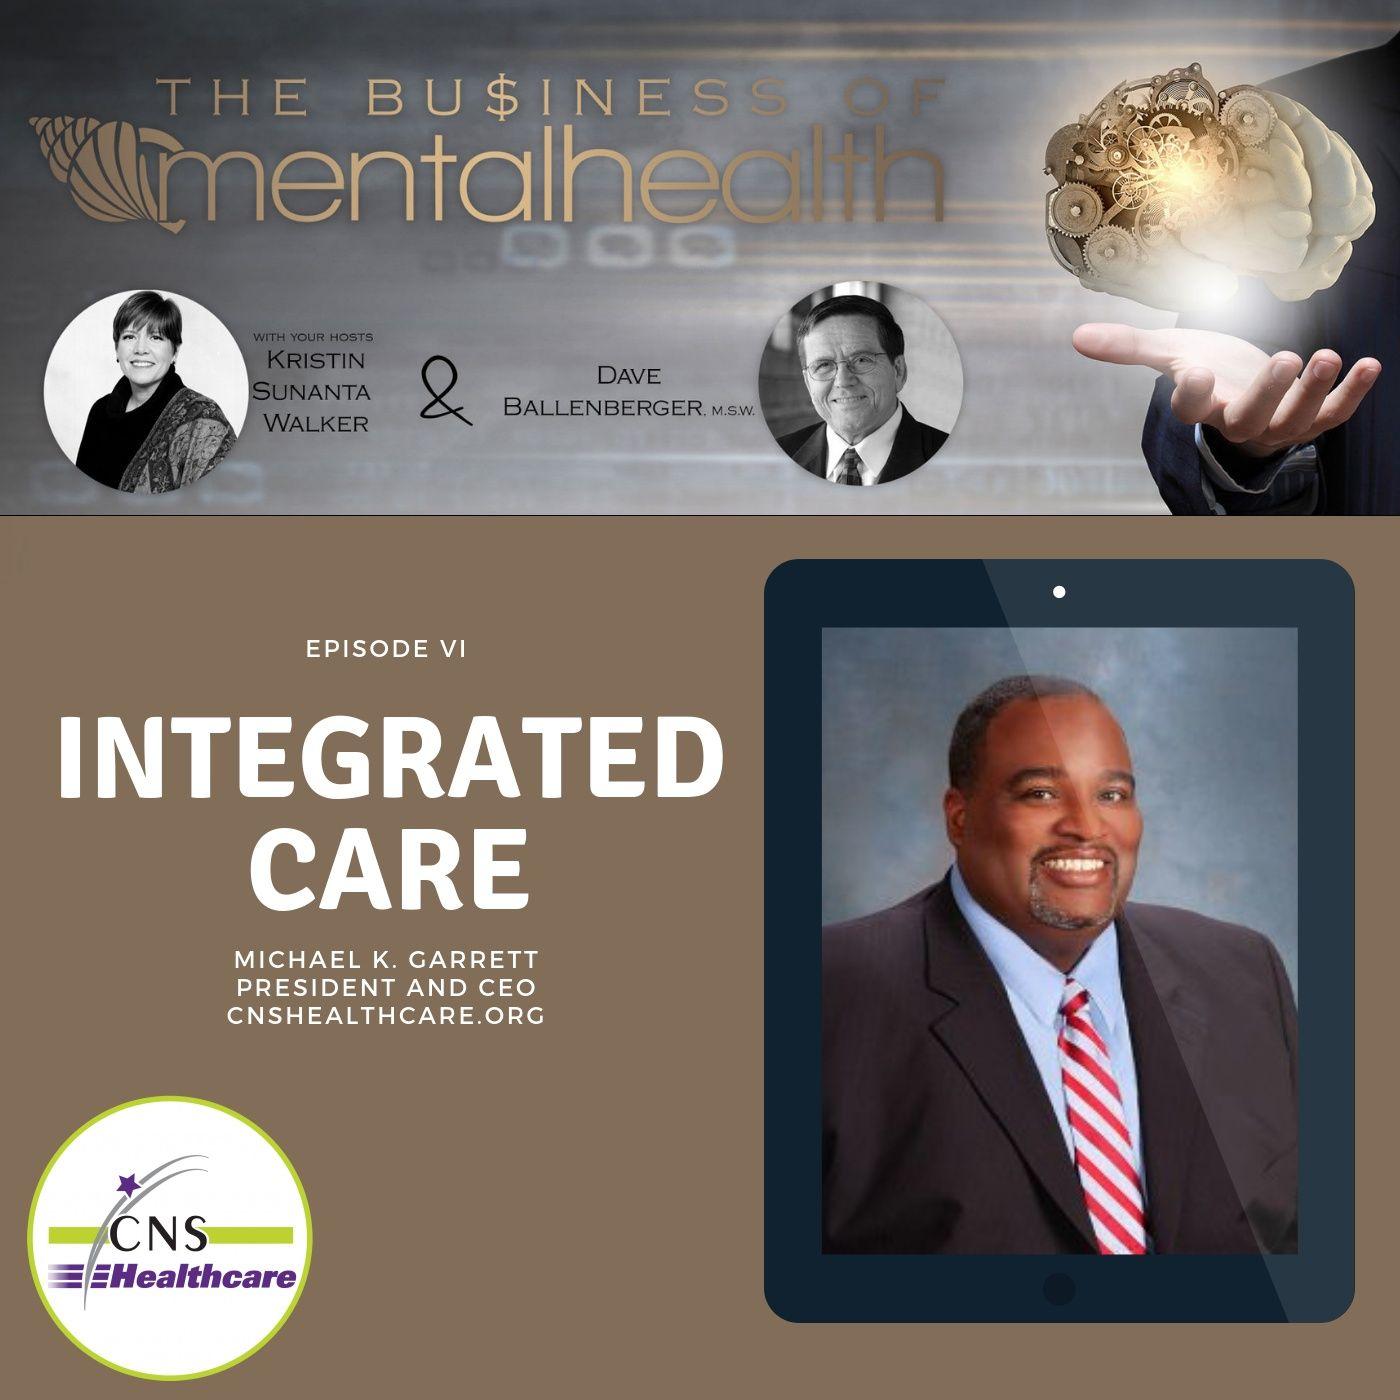 Mental Health News Radio - Mental Health Business: Integrated Care with Michael K. Garrett